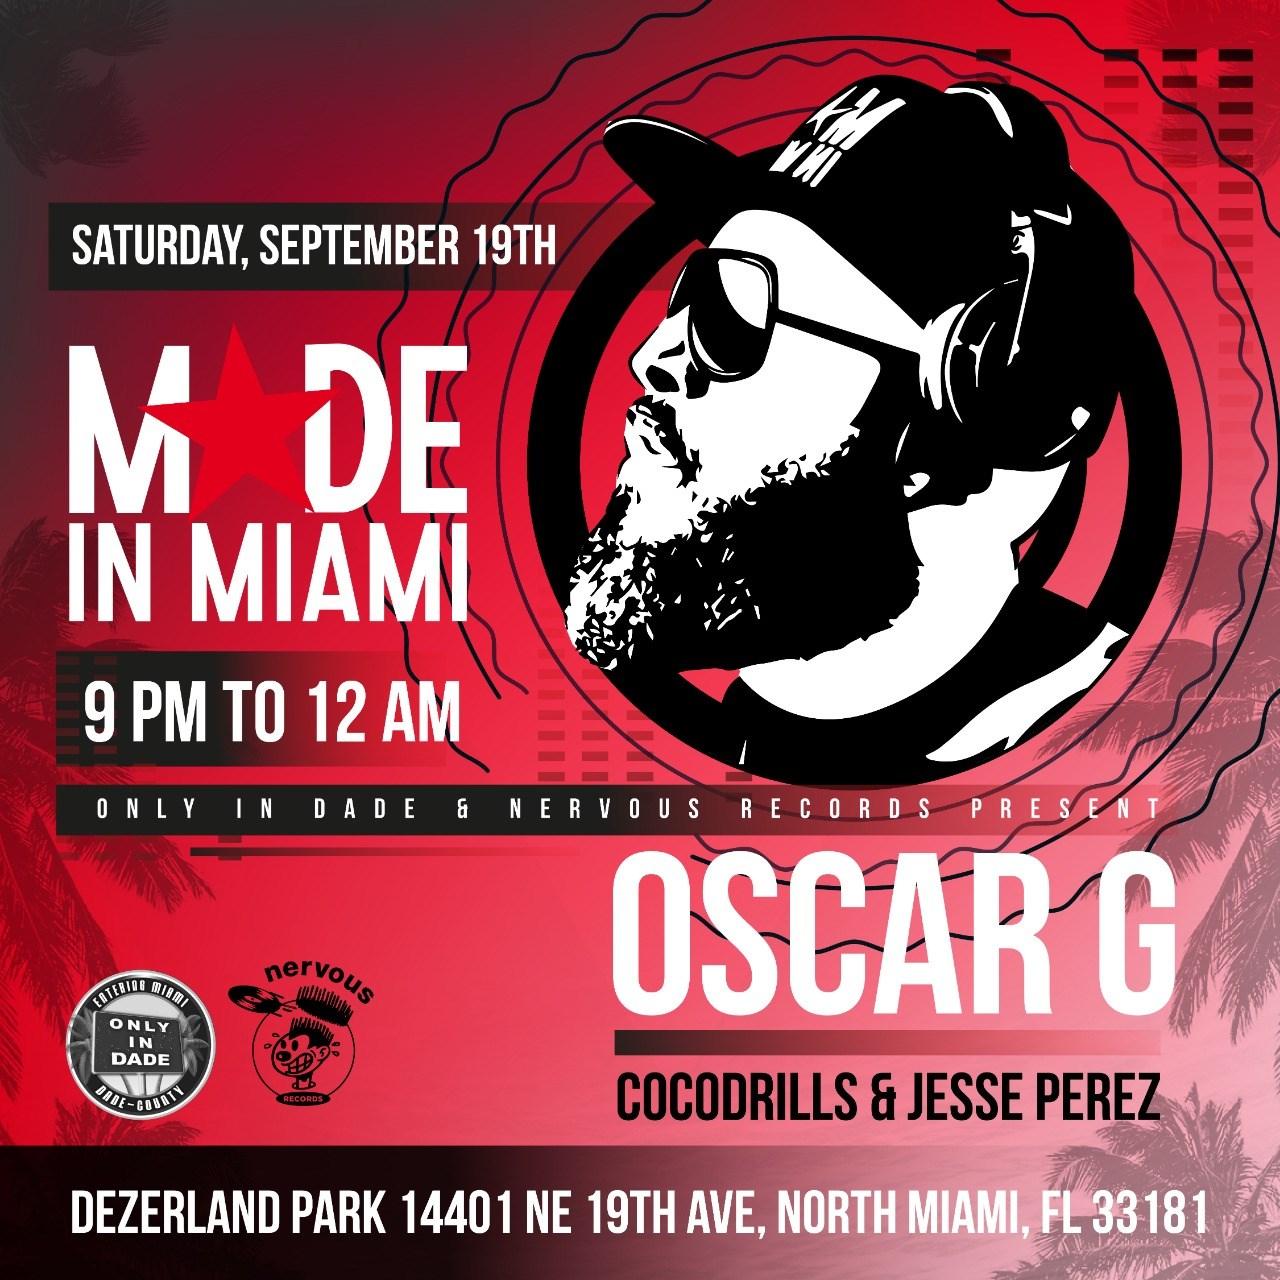 Made In Miami with Oscar G, Cocodrills, Jesse Perez - Flyer back